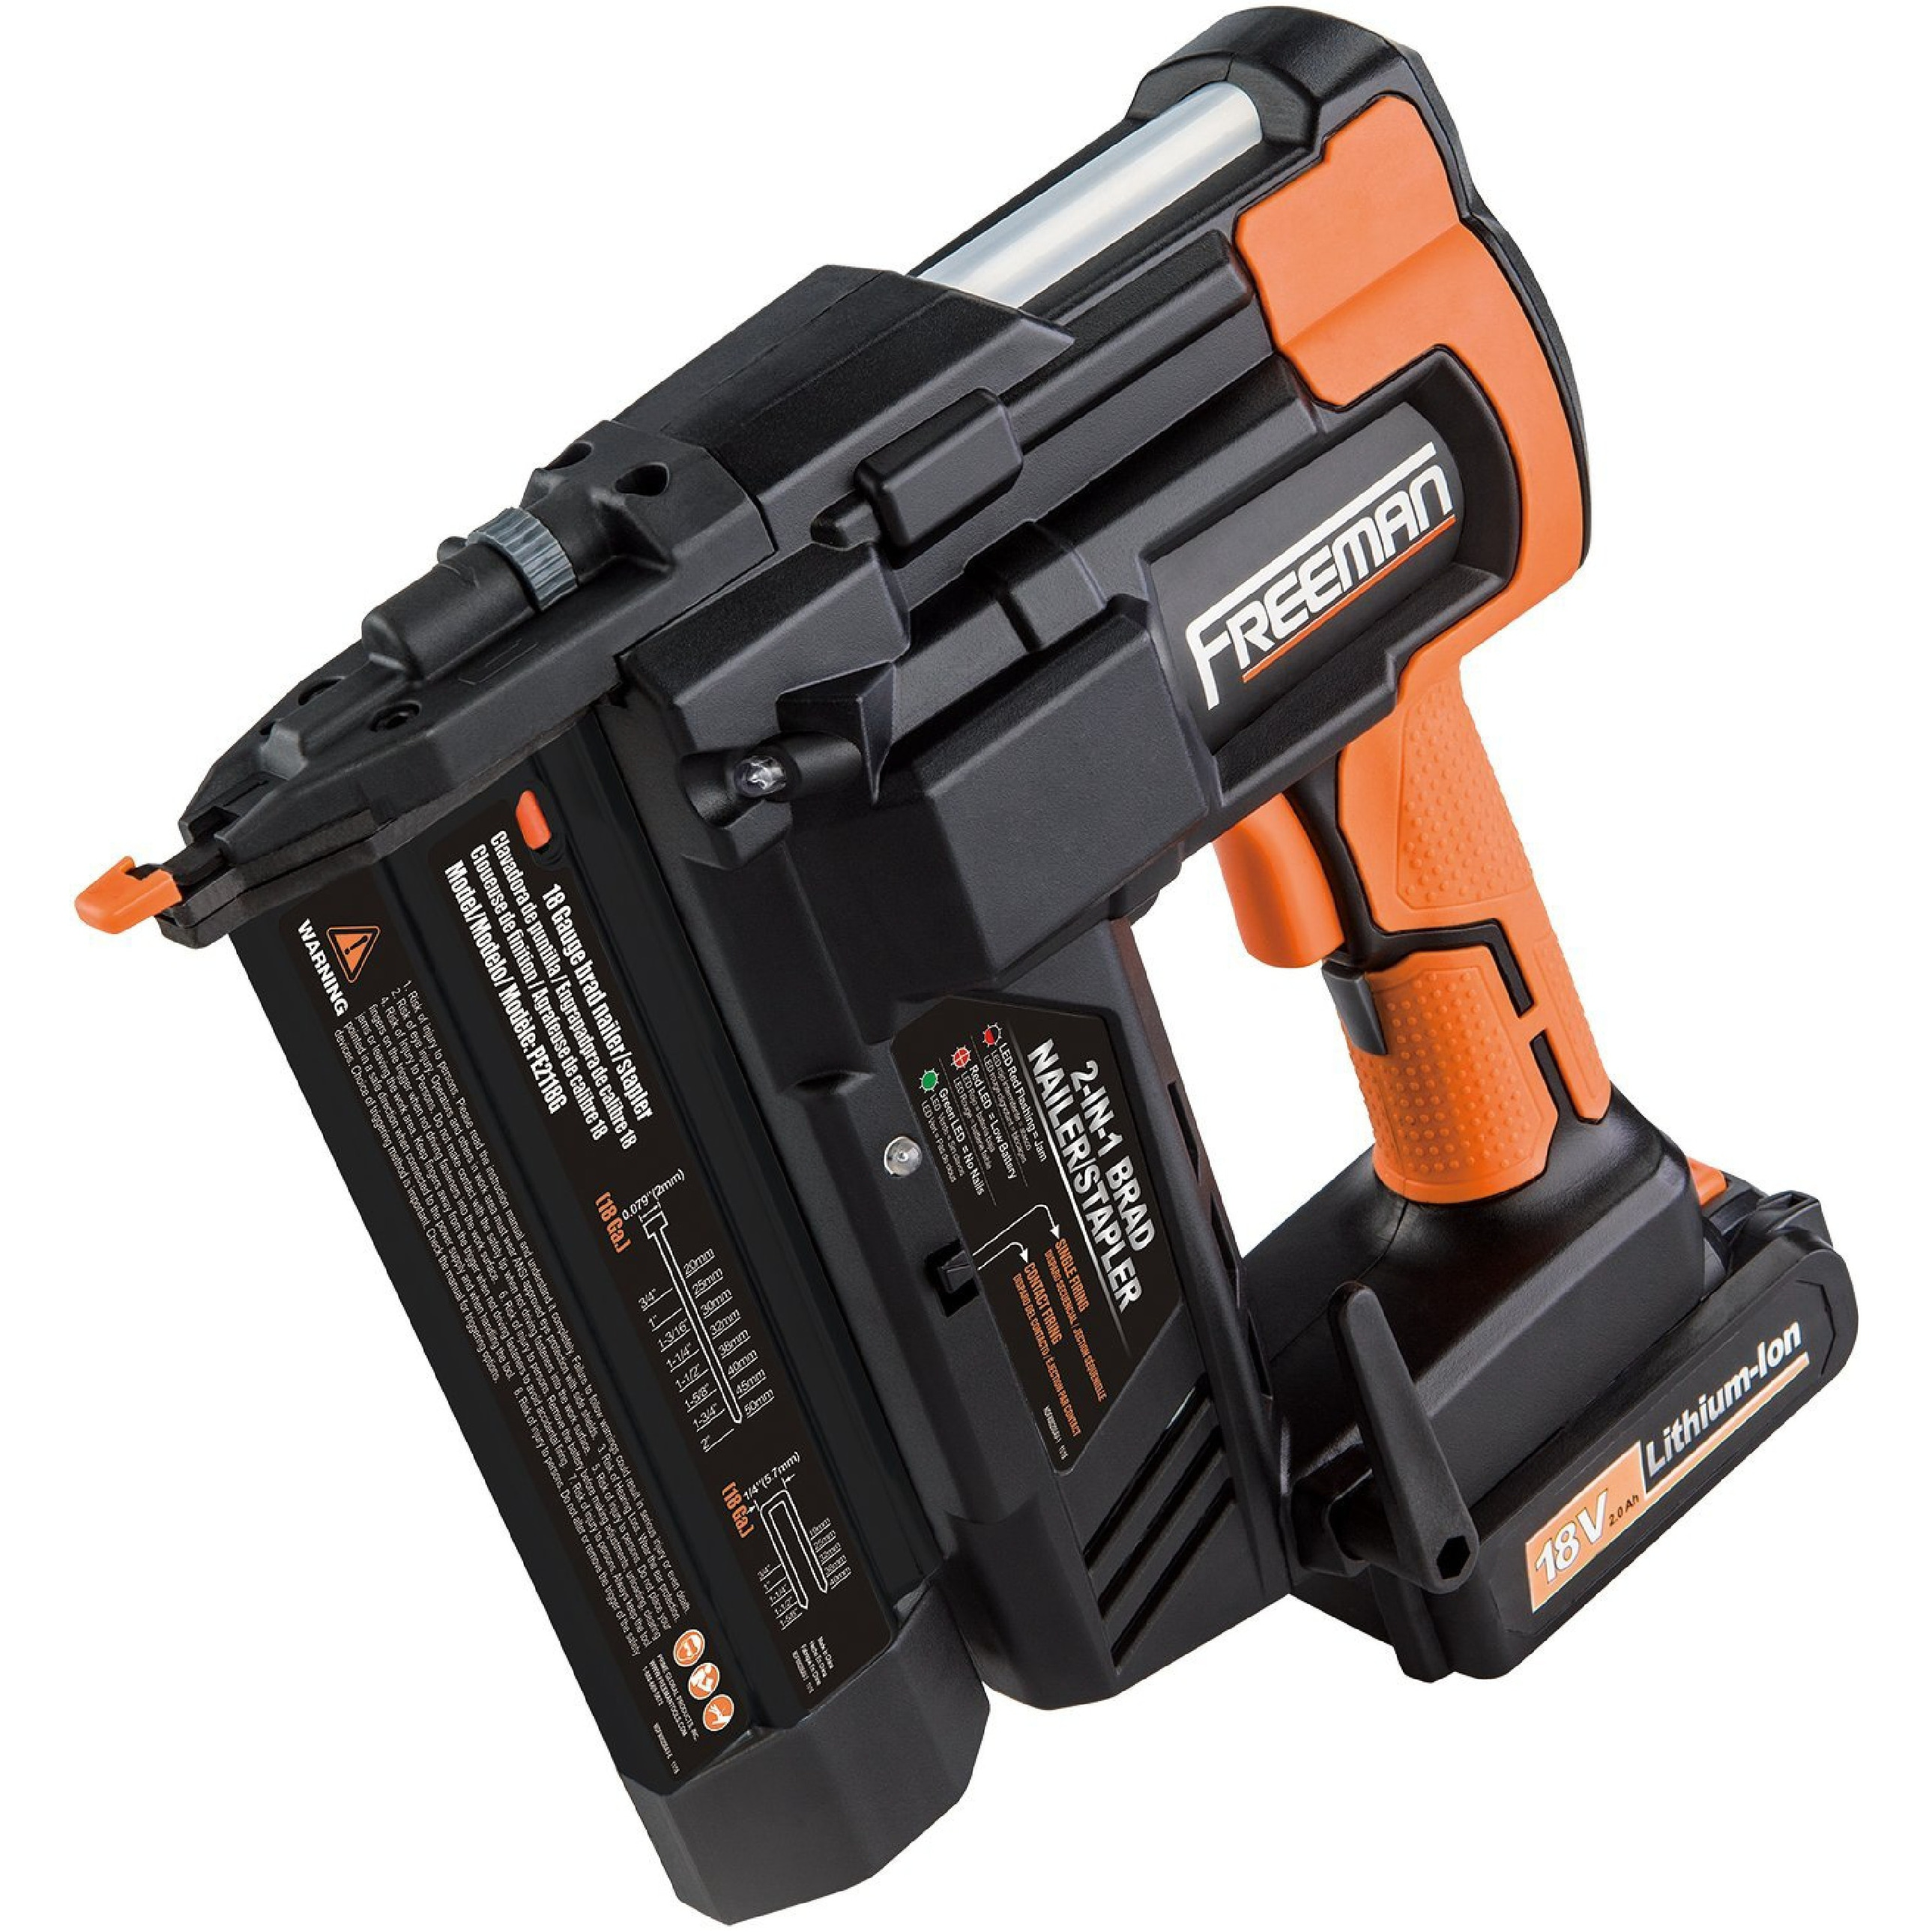 Freeman PE2118G 18 Volt 2-in-1 18 Gauge Cordless Nailer & Stapler - Orange